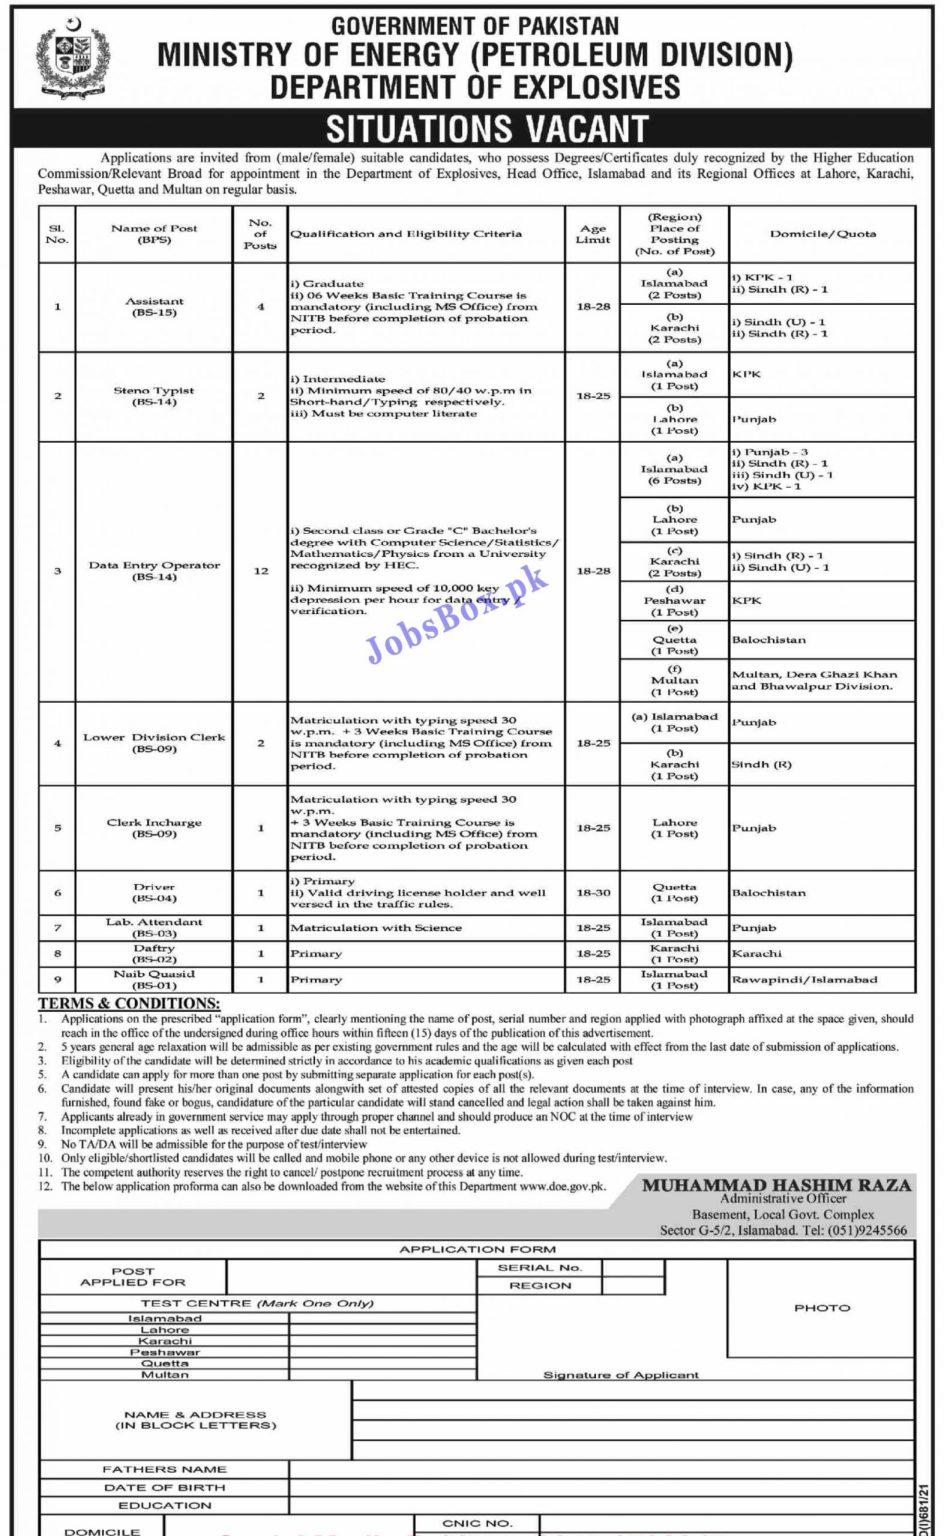 www.doe.gov.pk Jobs 2021 - Ministry of Energy Jobs 2021 in Pakistan